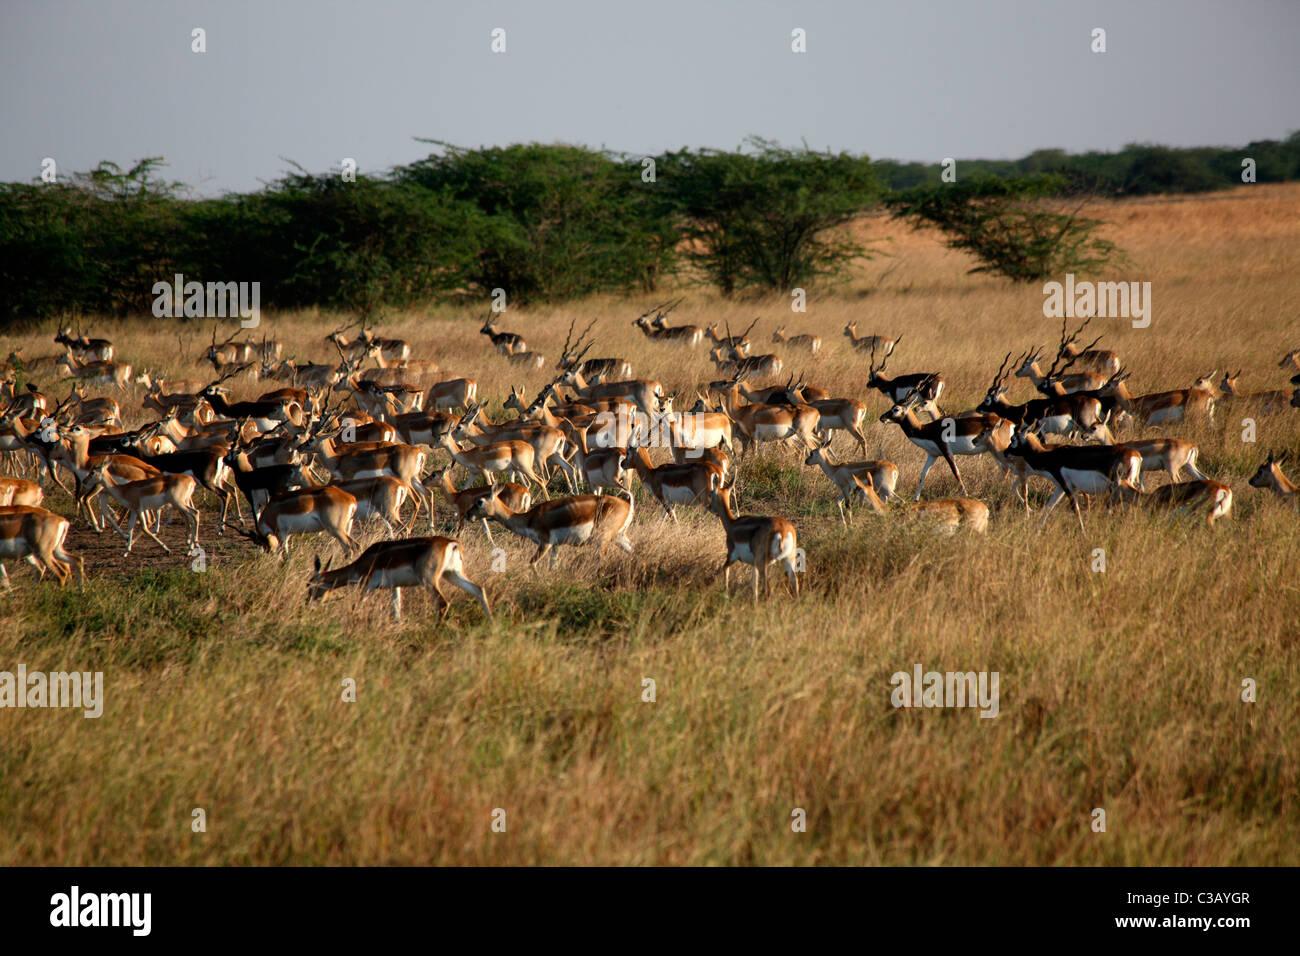 A herd of black bucks - Stock Image